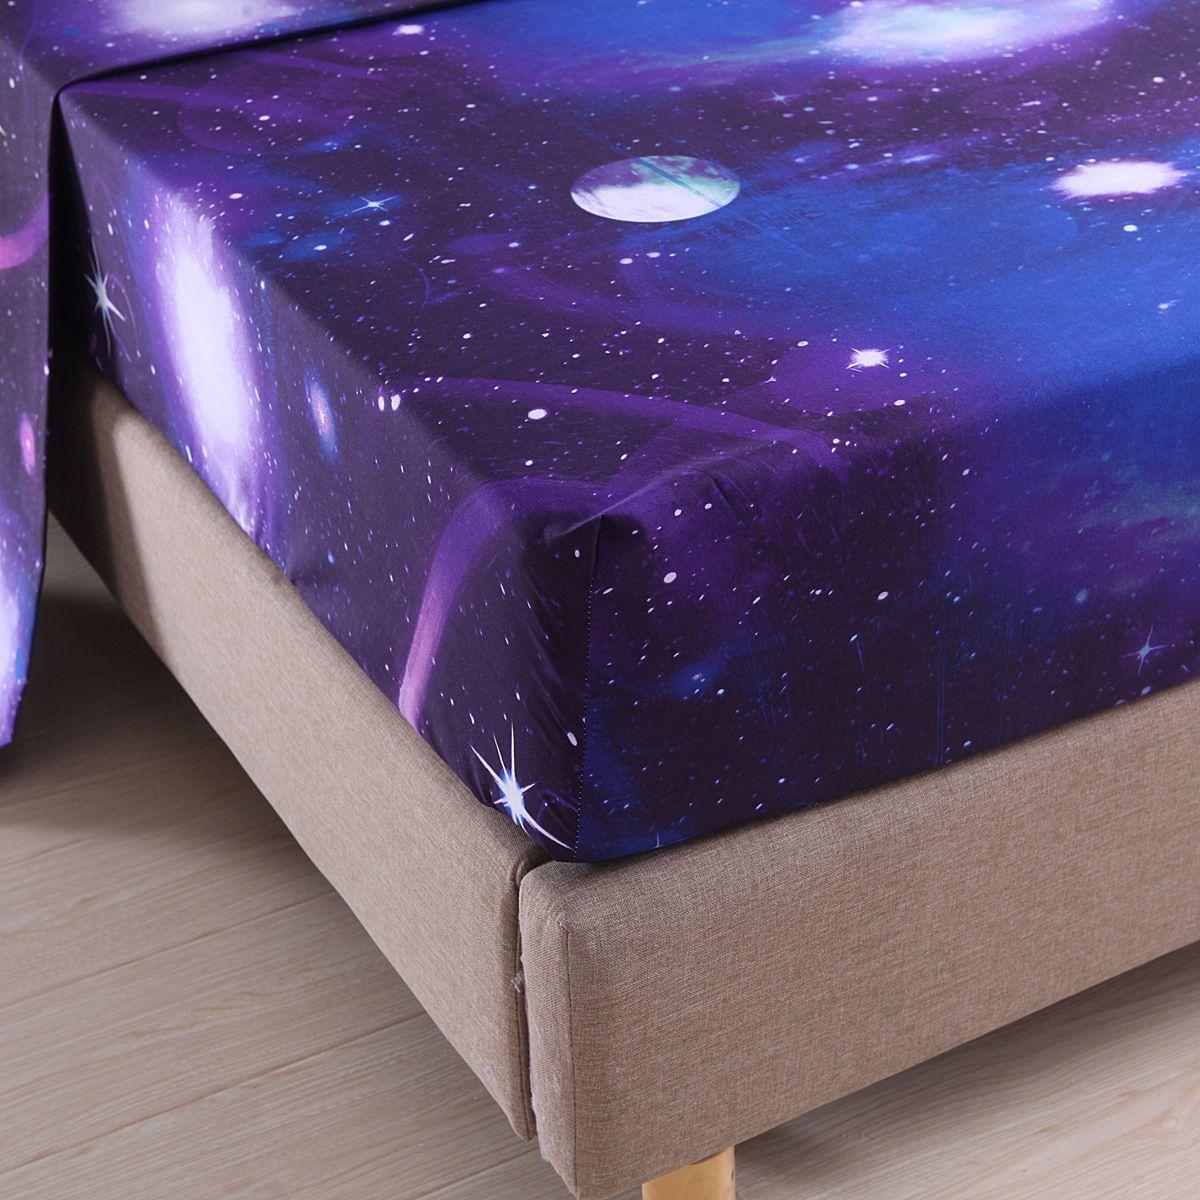 3D Galaxy Starry Sky Sheet Sets /Flat Sheet Fitted Sheet Pillowcase Comfy Bedding Twin/Full/Queen/ King